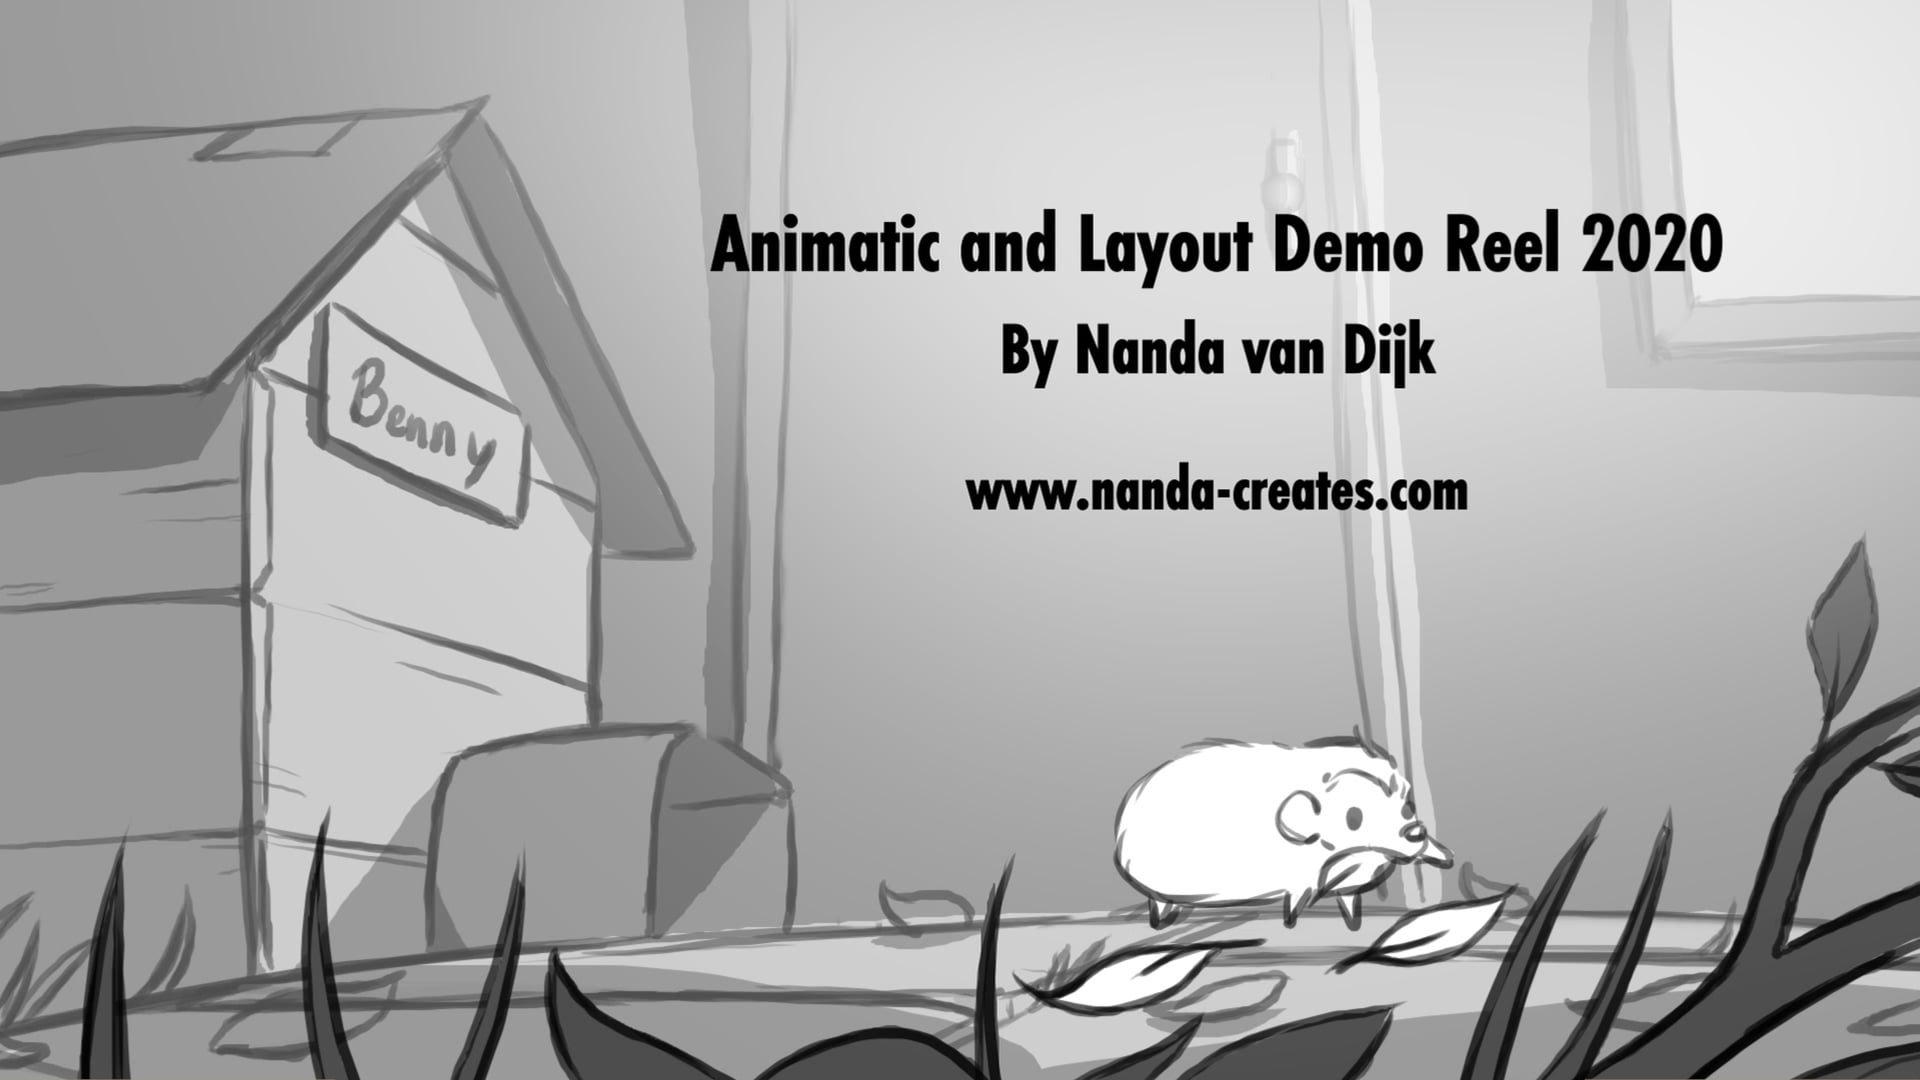 Animatic and Layout Demo Reel 2020 by Nanda van Dijk